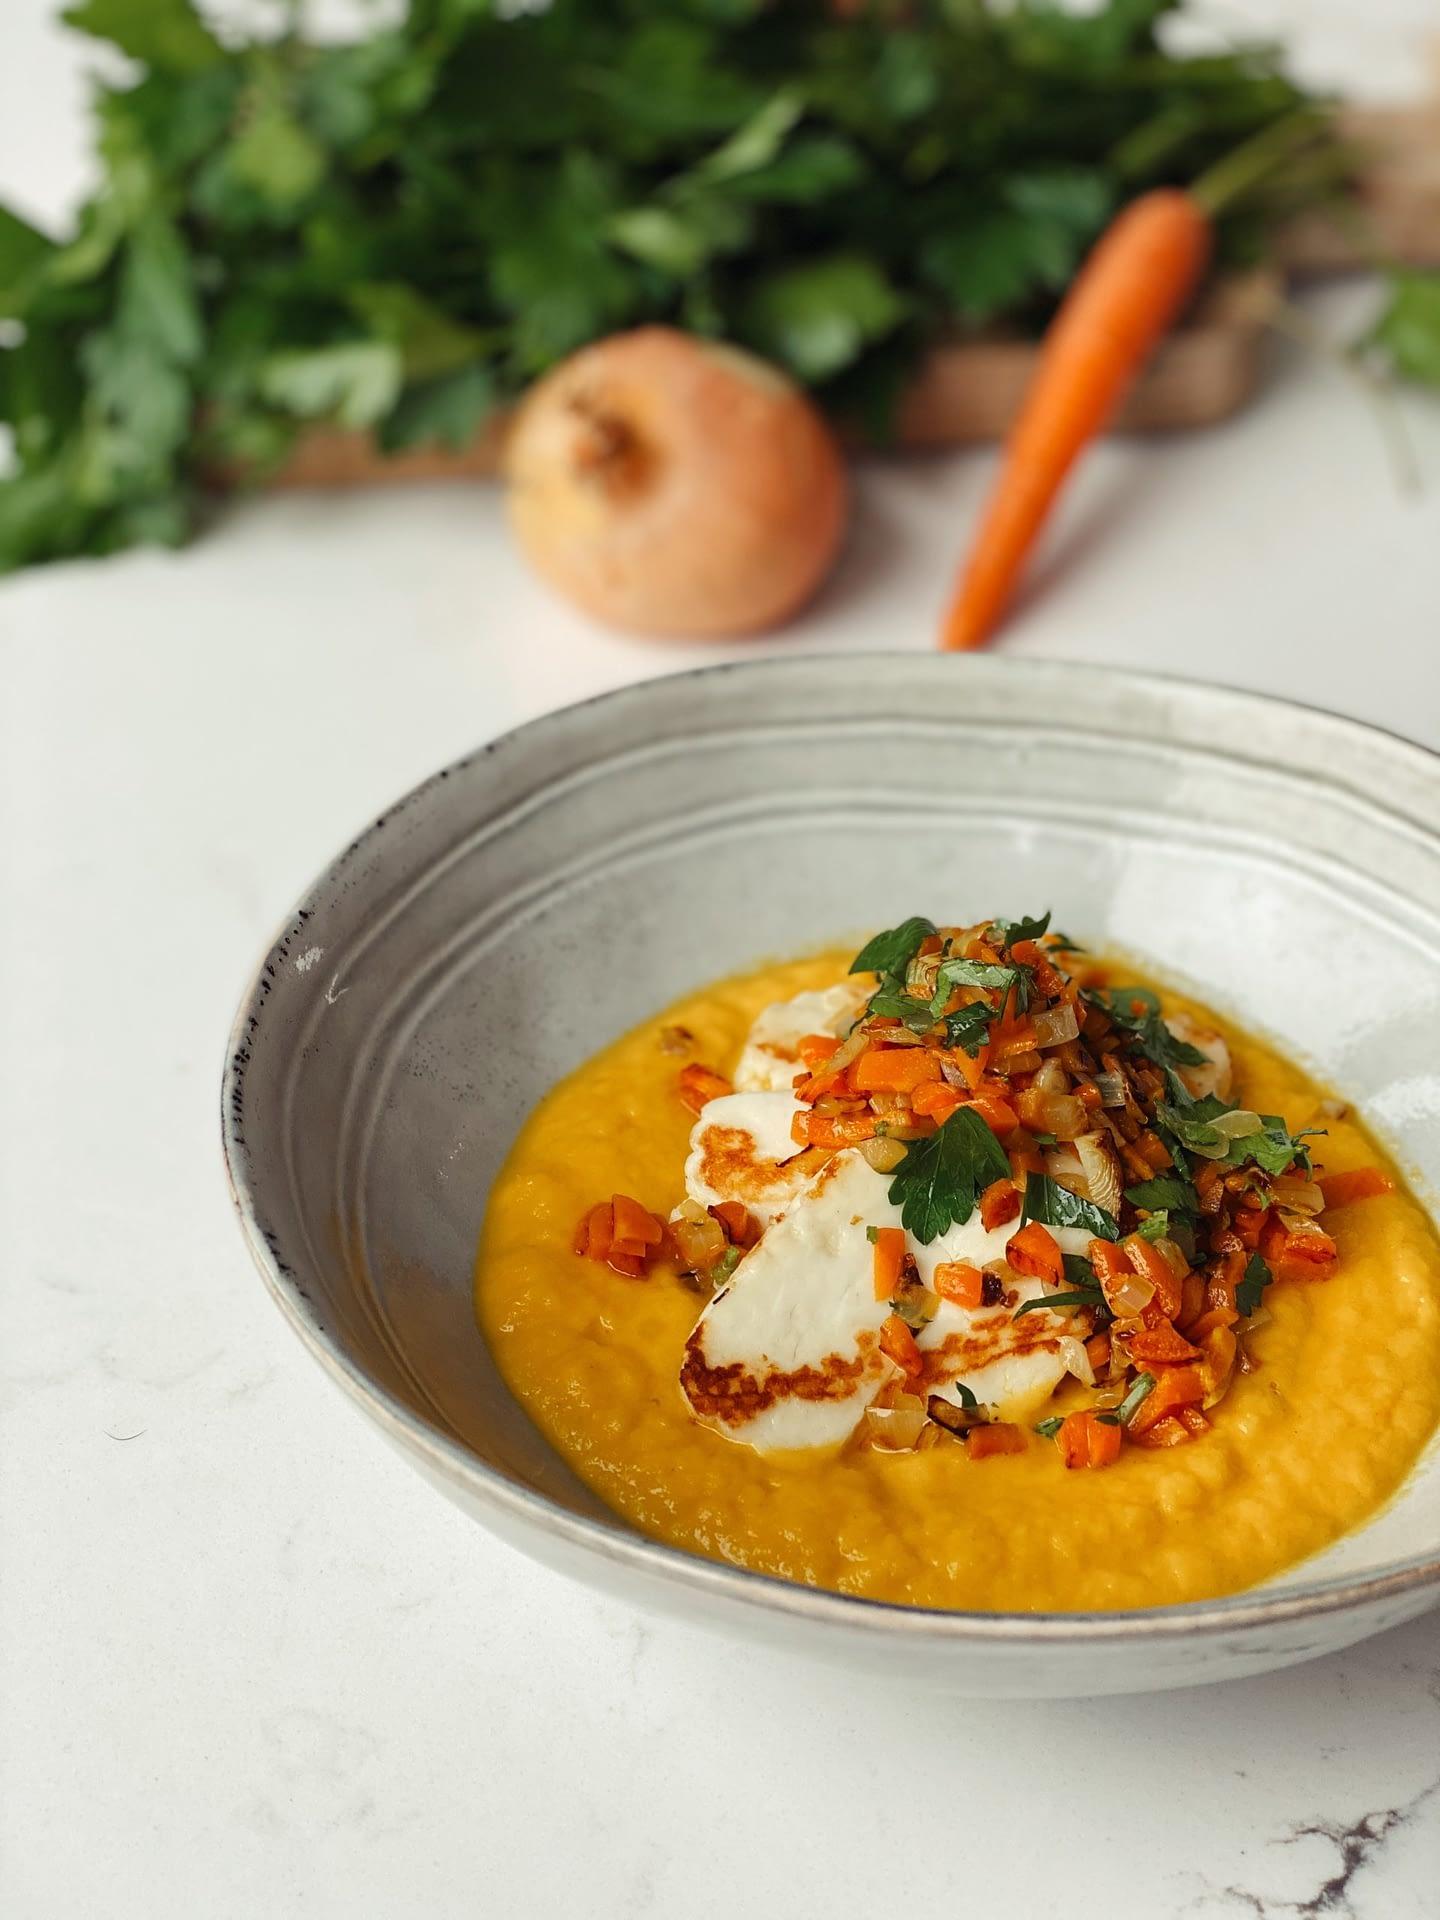 Halloumi aux carottes